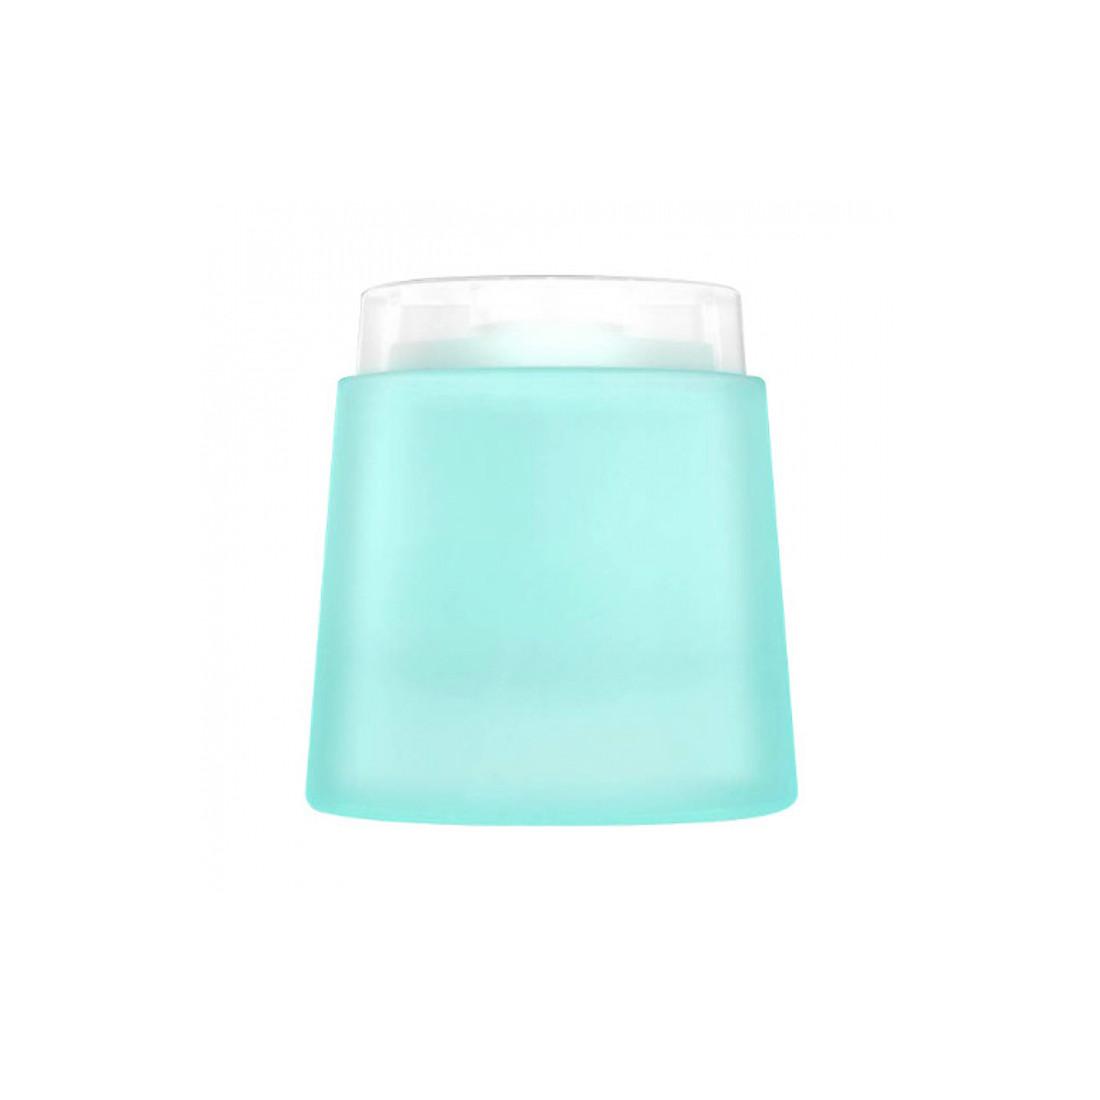 Сменный блок мыла Xiaomi Mi Auto Foaming Hand Wash XiaoJi (Cyan, Pink)